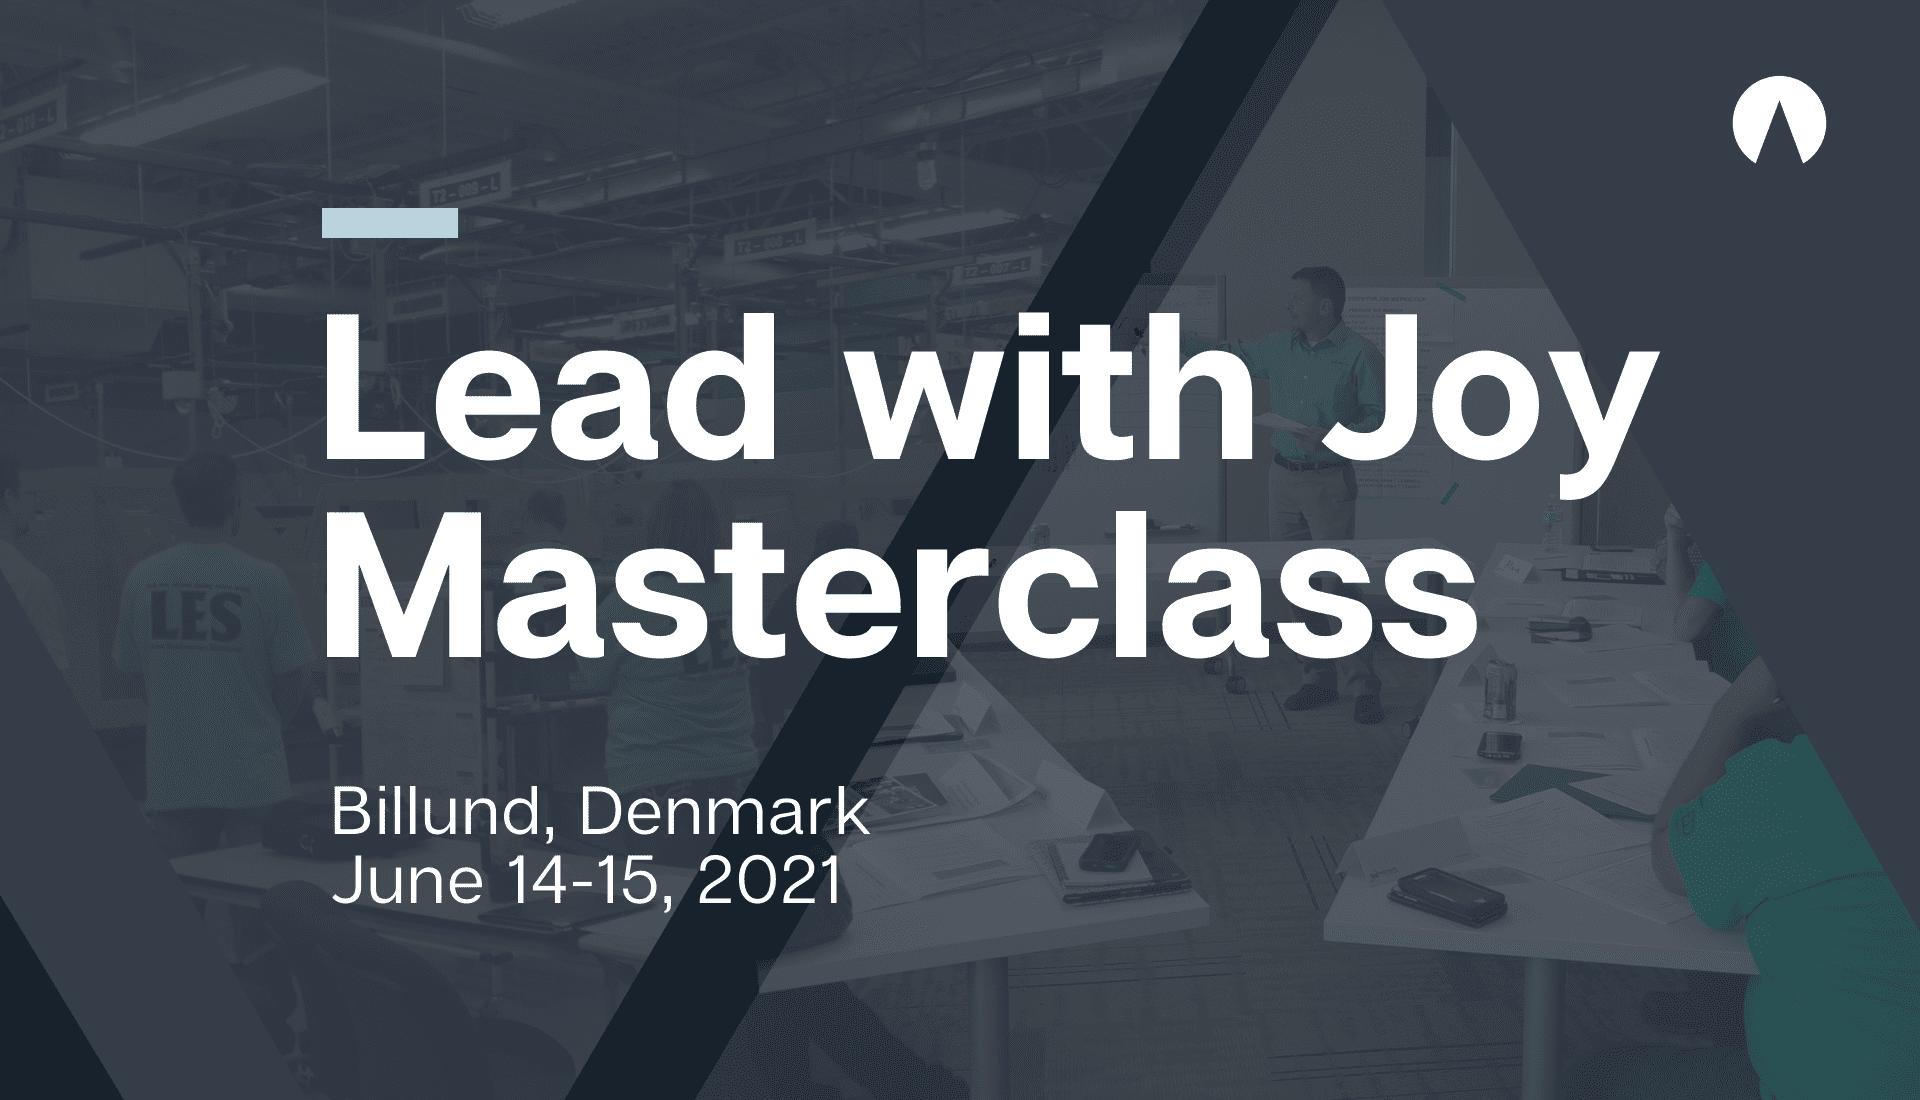 Lead with Joy Masterclass